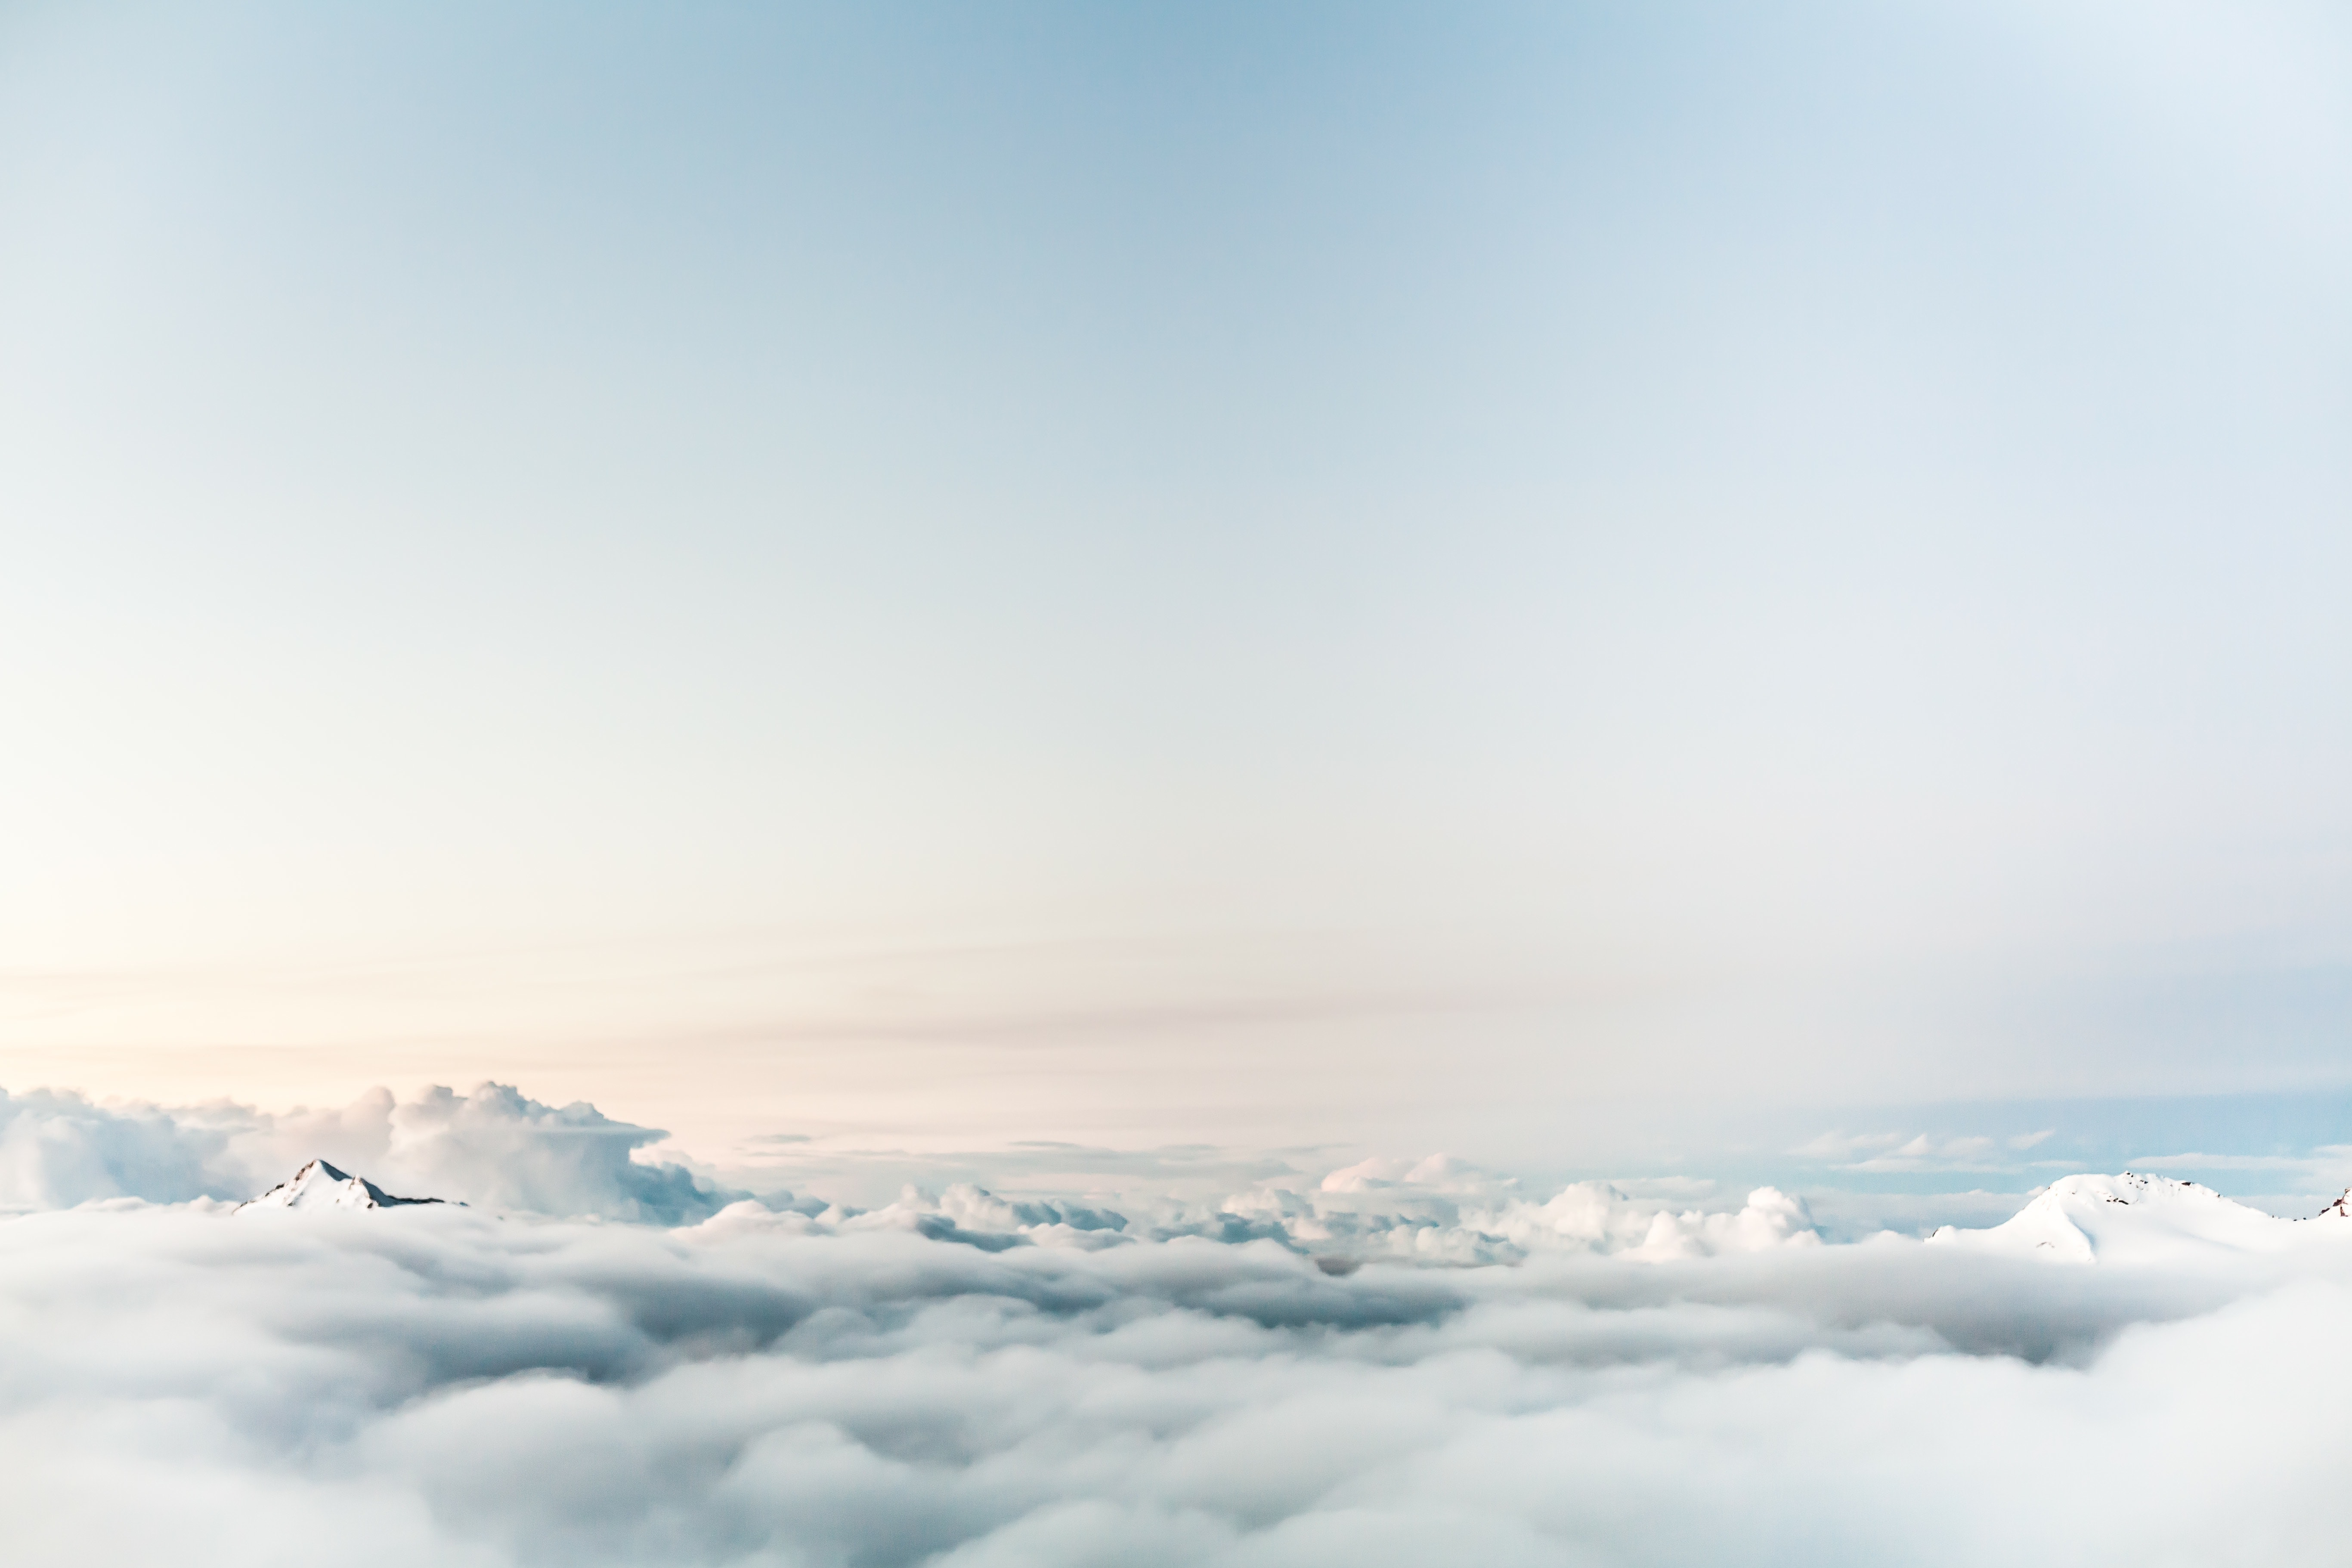 clouds peaxe.jpg